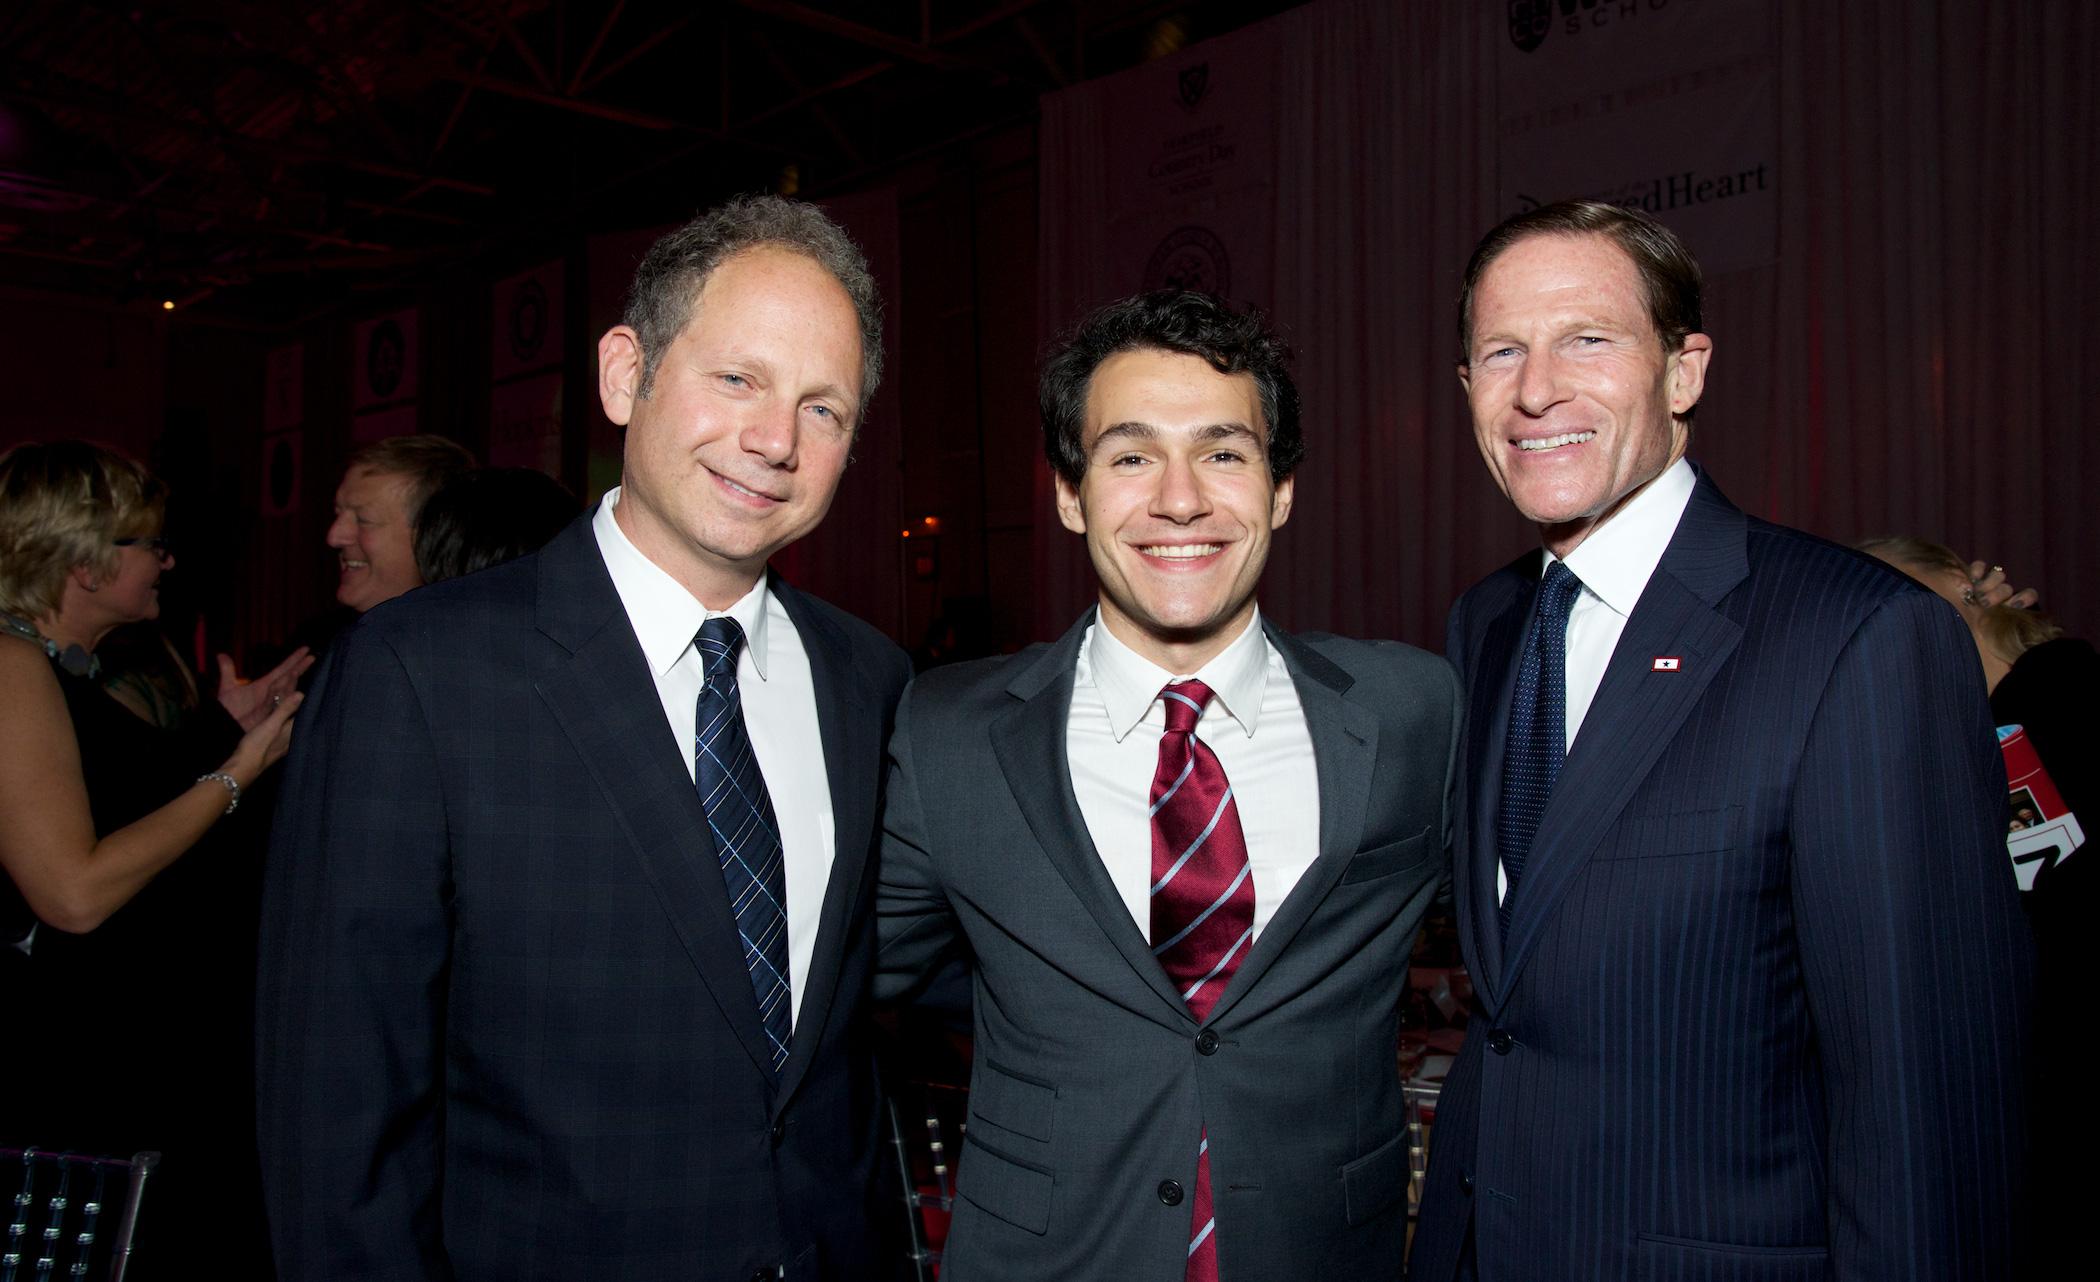 Masters of Ceremonies Rob Burnett, Honoree Jetson Leder-Luis and Senator Richard Blumenthal